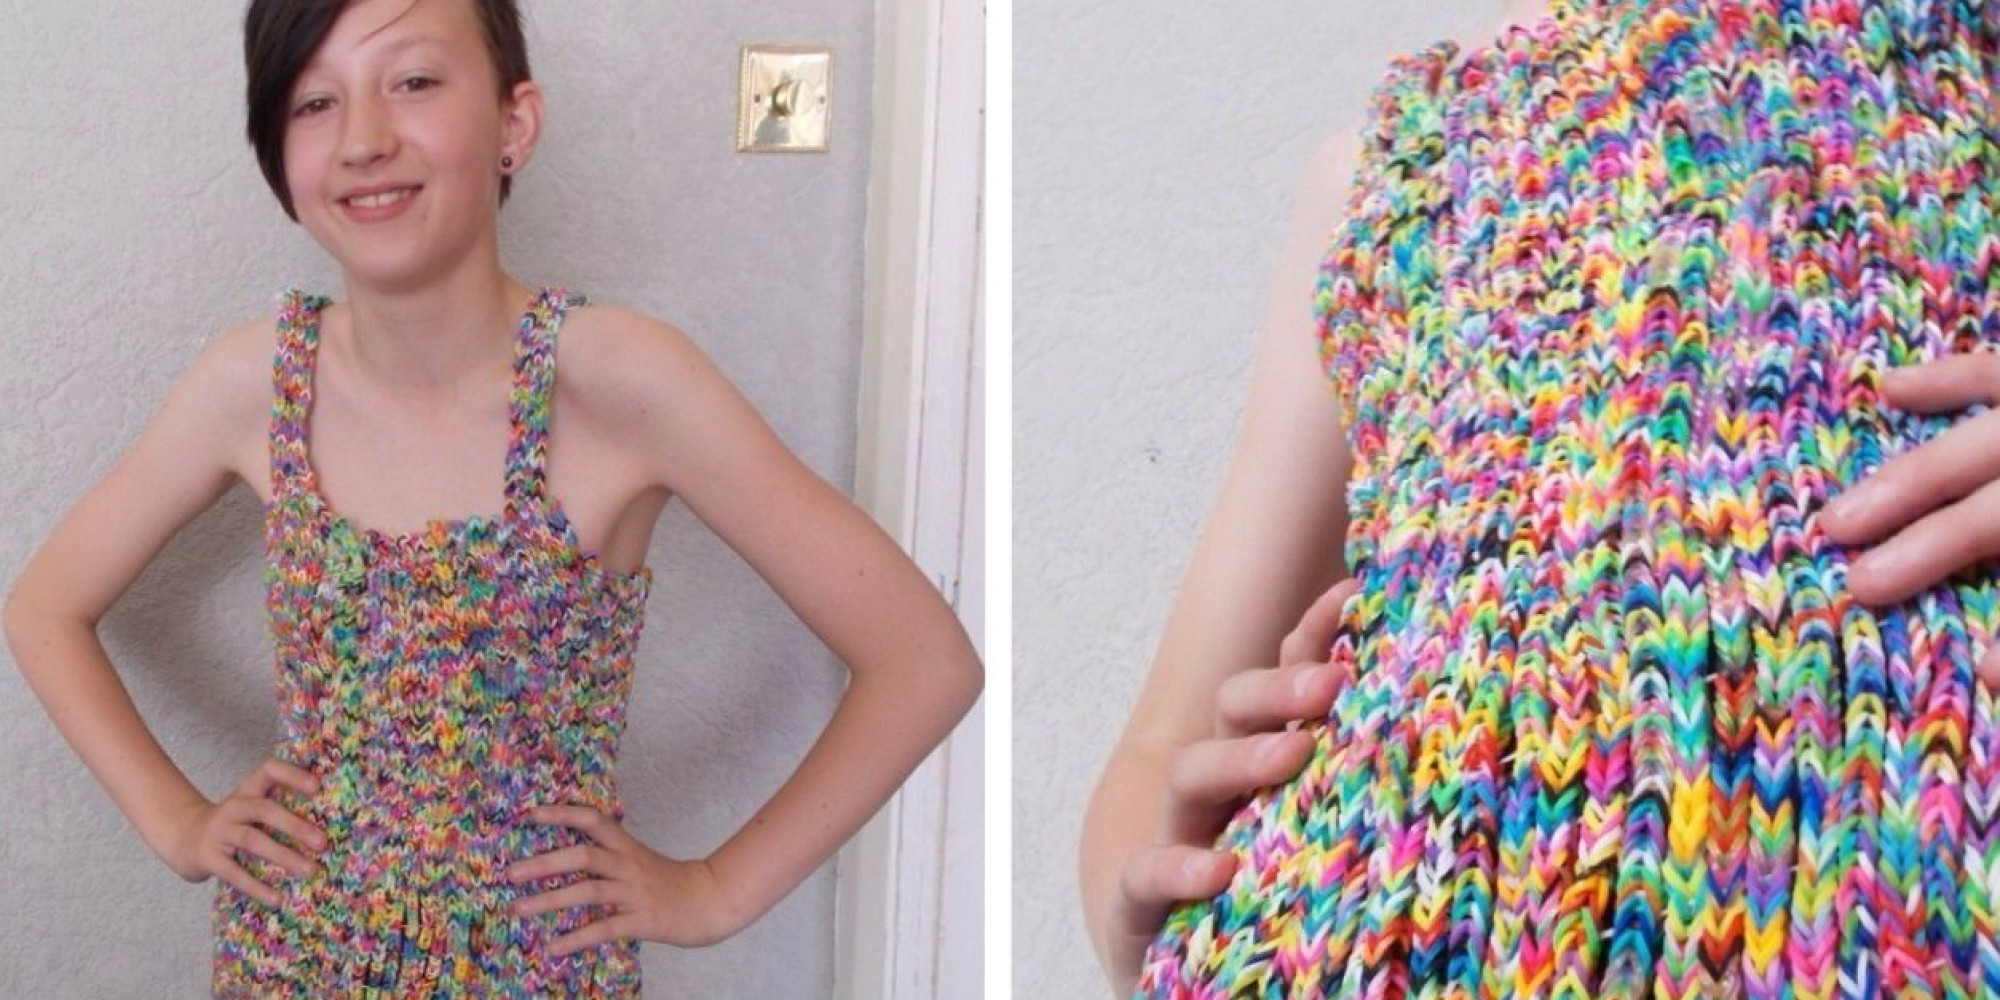 o-LOOM-BAND-DRESS-facebook